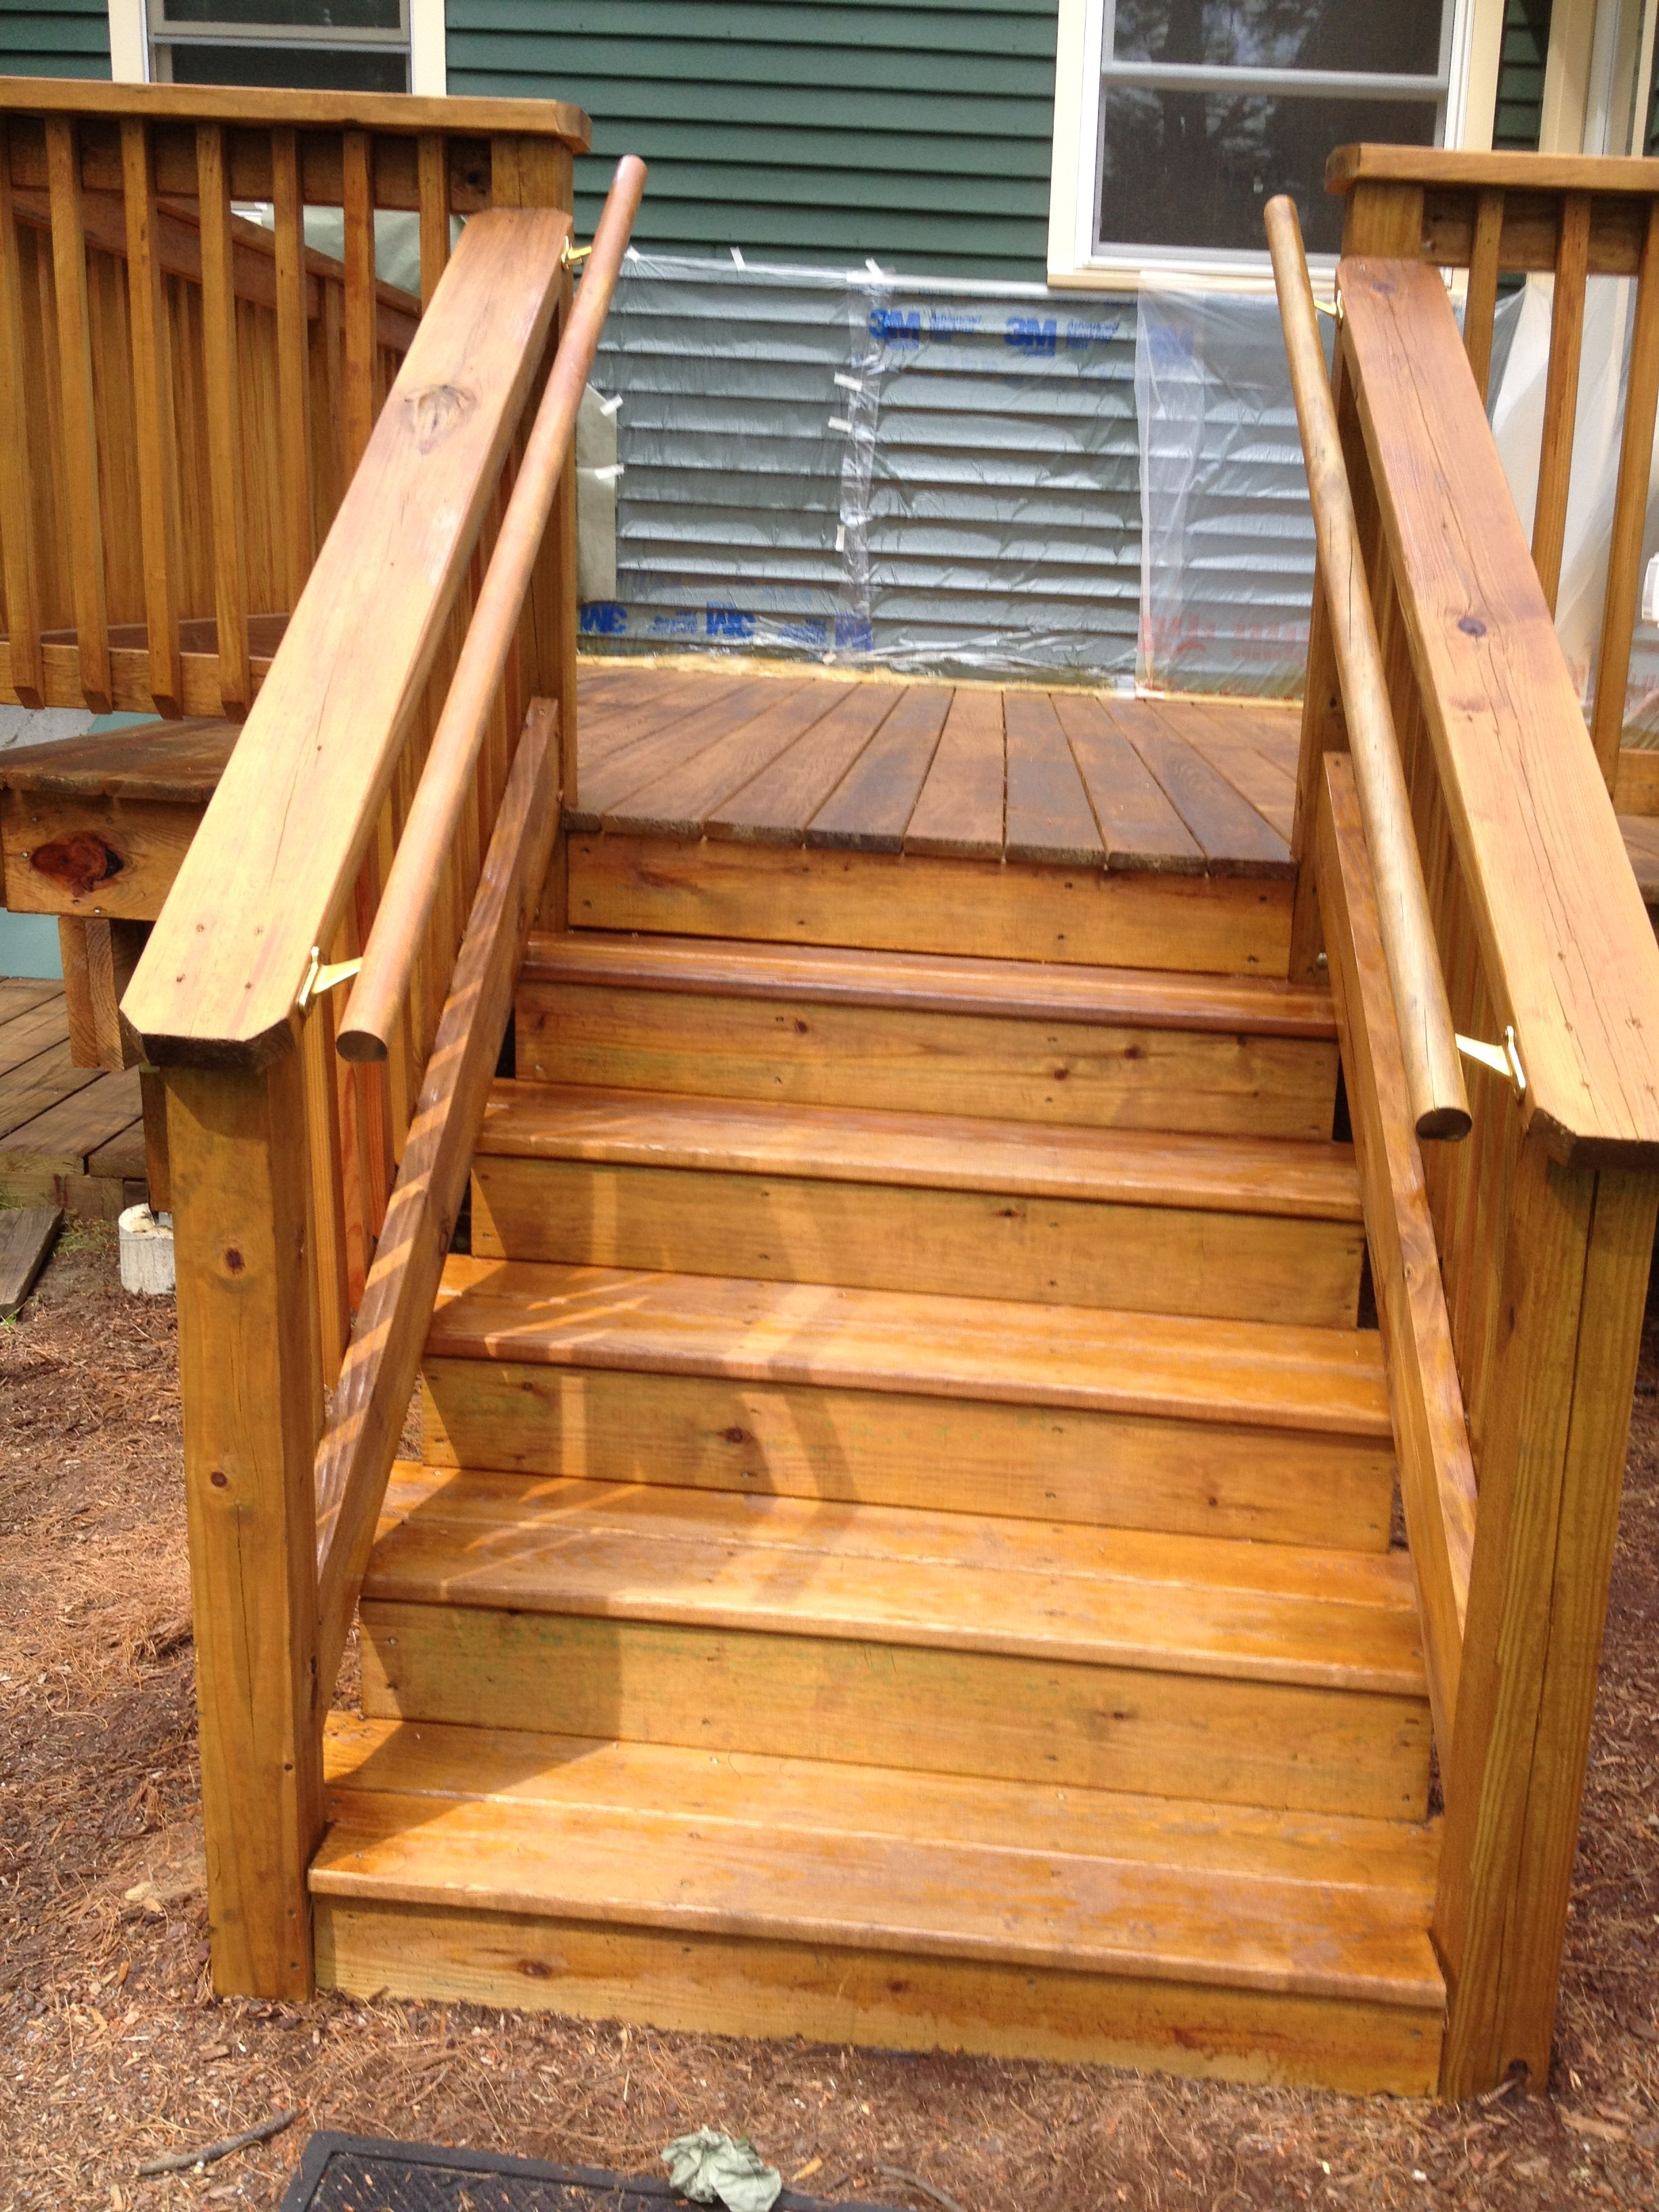 Pressure Treated Wood Deck In Attleboro Ma Twp Cedar | Pressure Treated Wood Steps